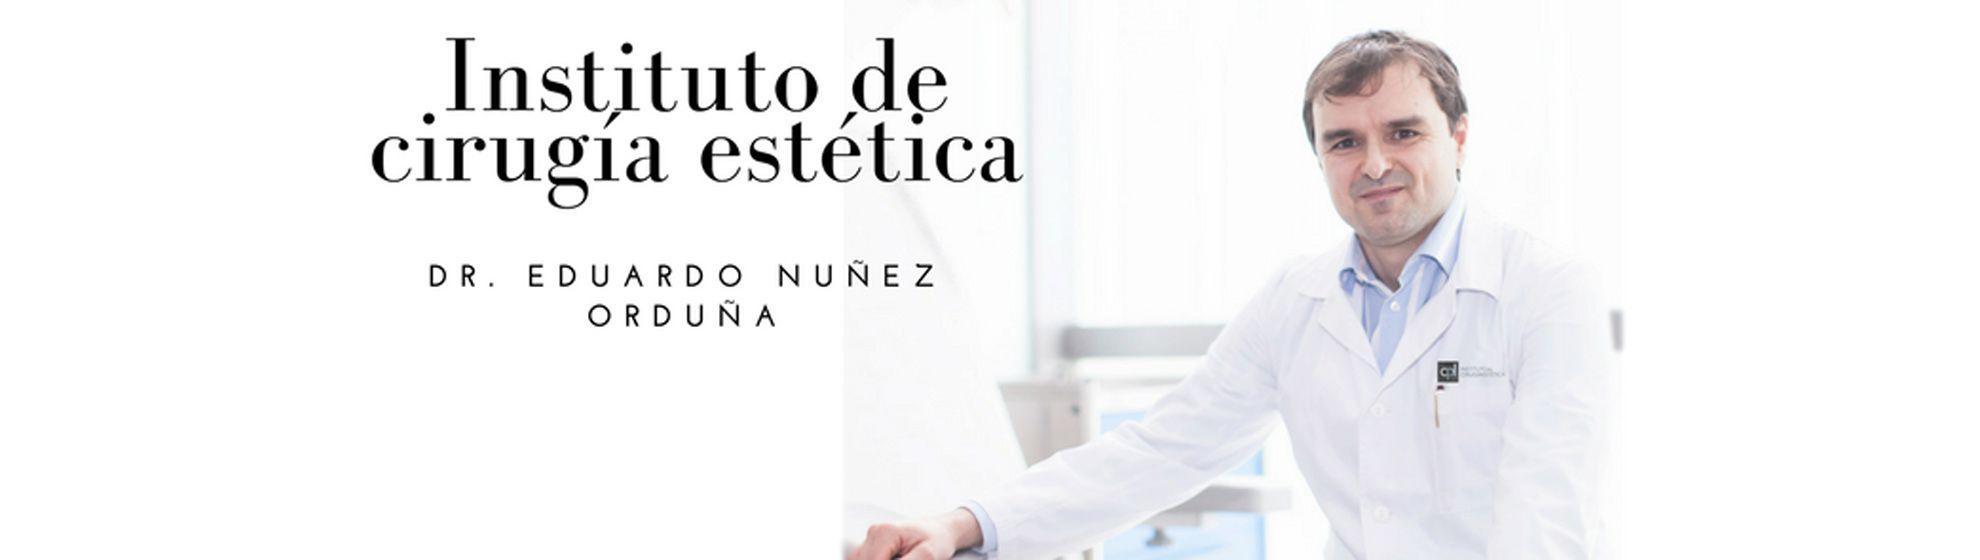 Instituto de cirugía estética